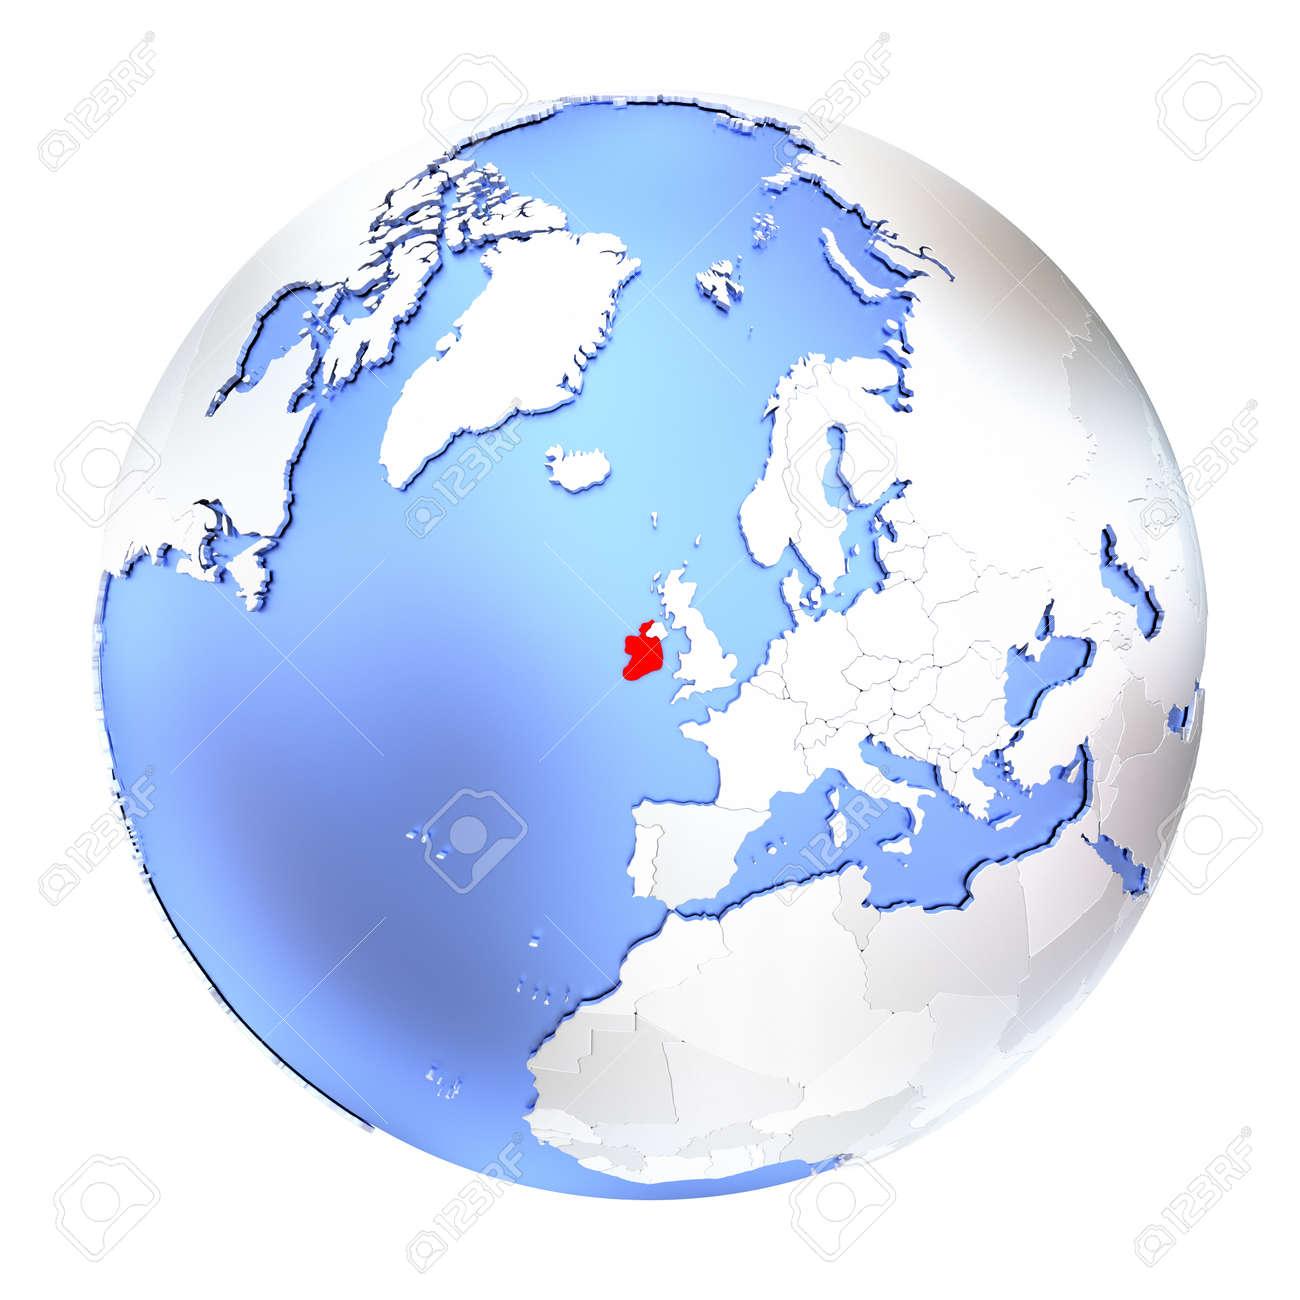 Map Of Ireland 3d.Stock Illustration